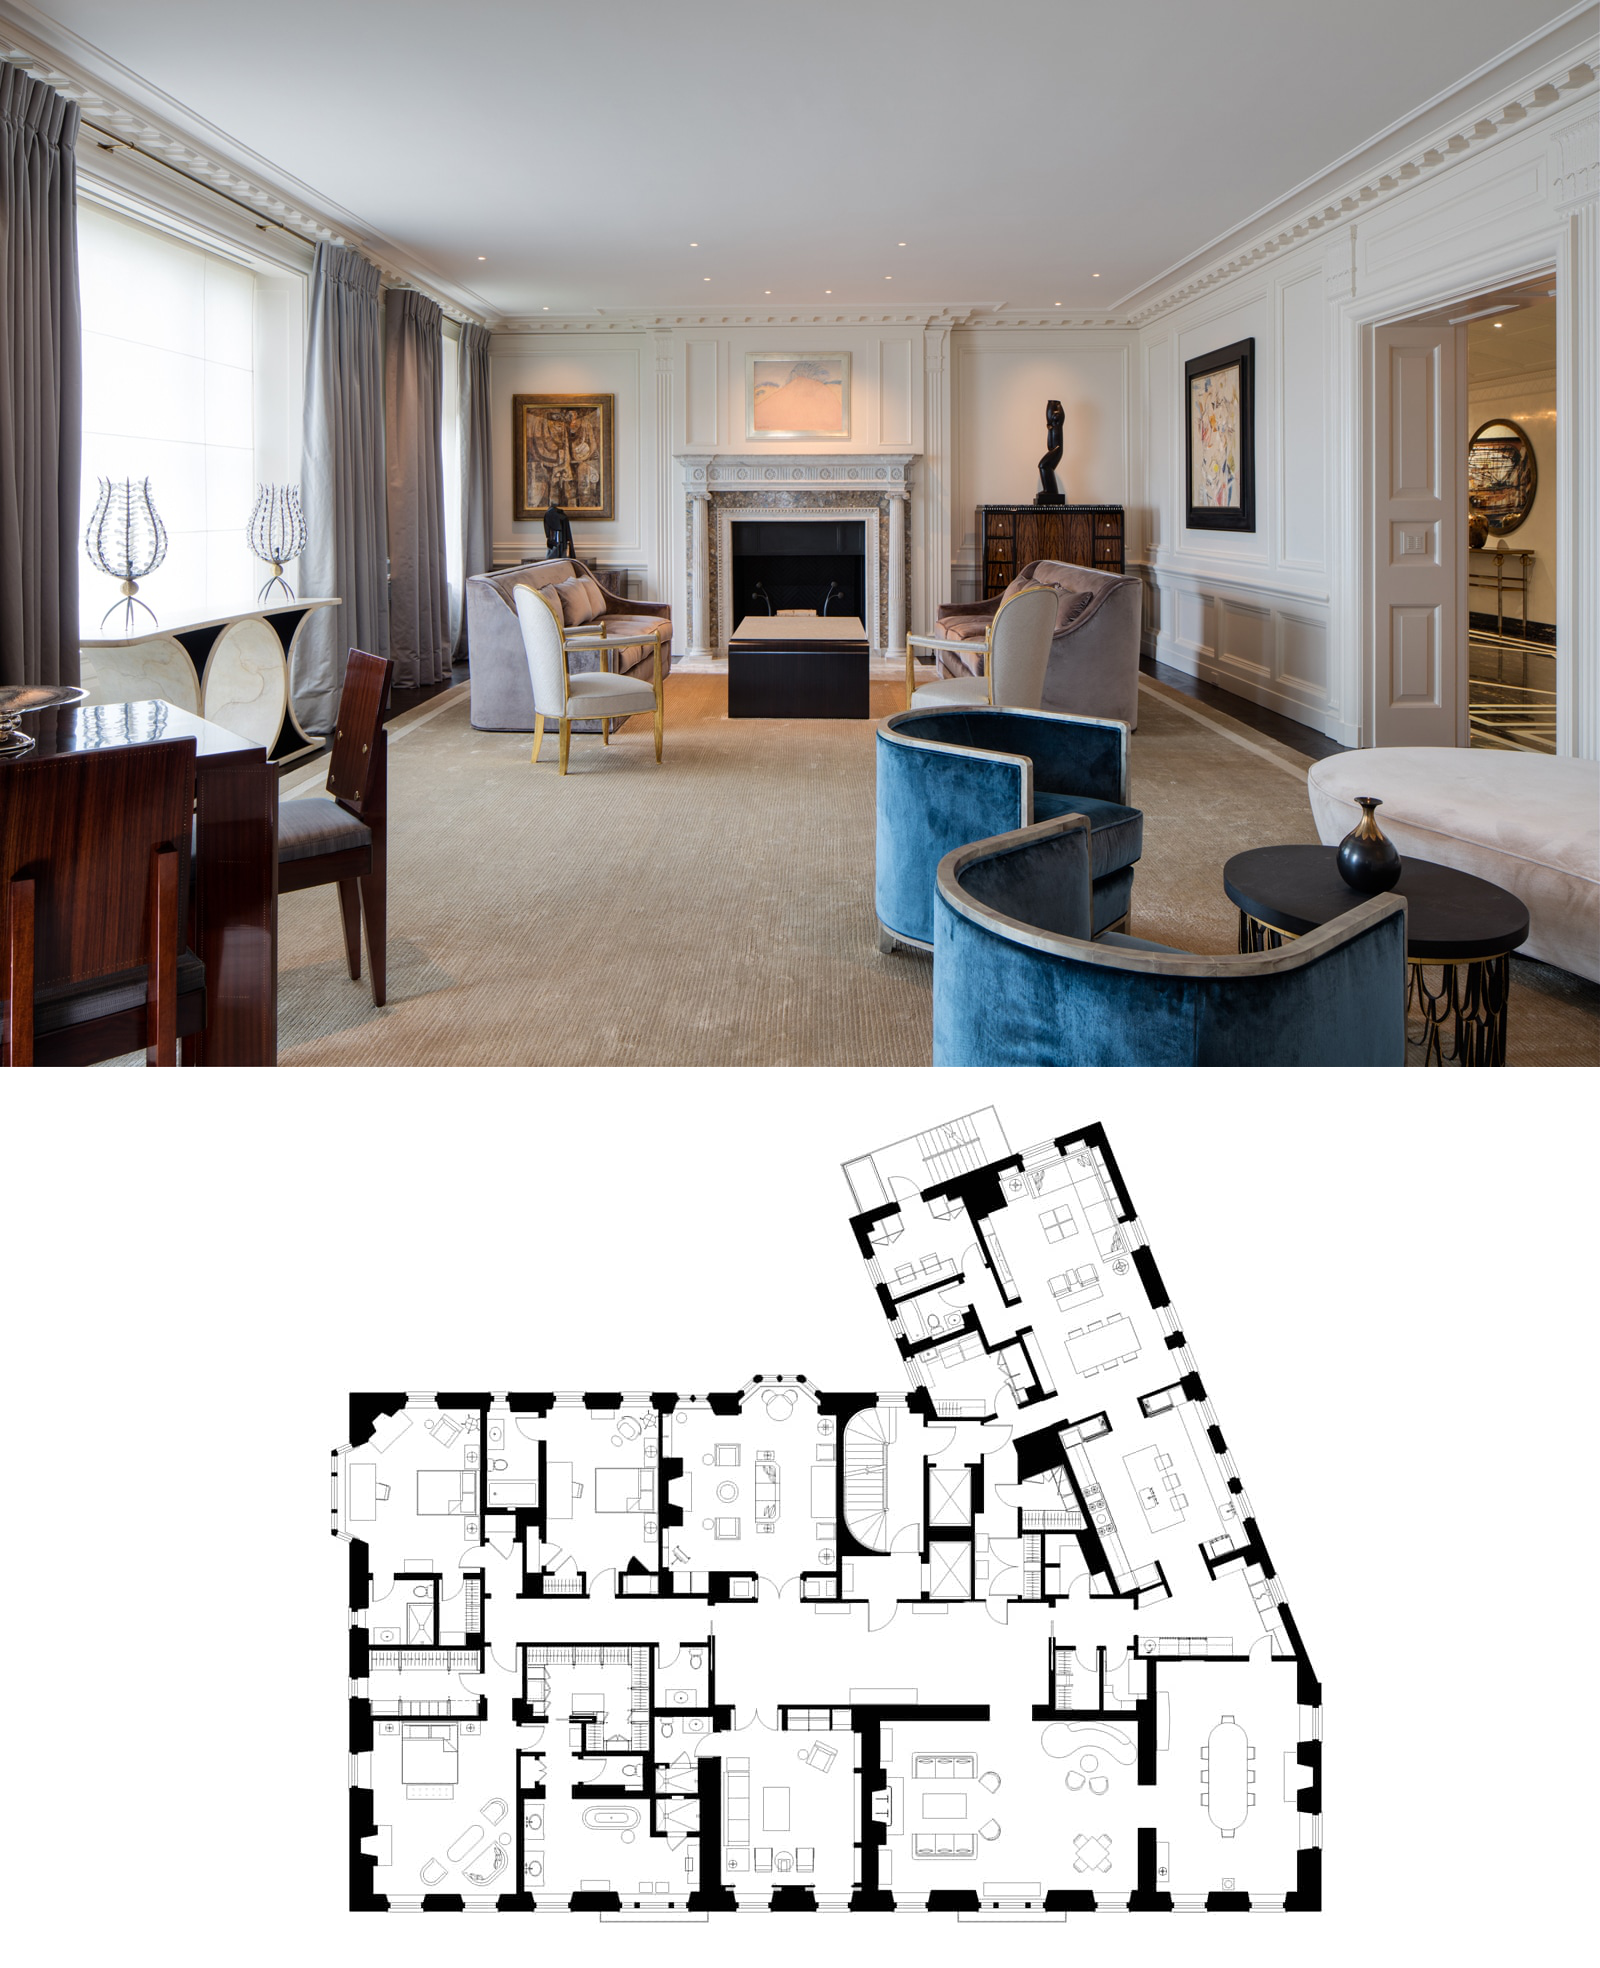 Lakeview Apartment Vinci Hamp Architects Condo Floor Plans Apartment Floor Plans House Floor Plans